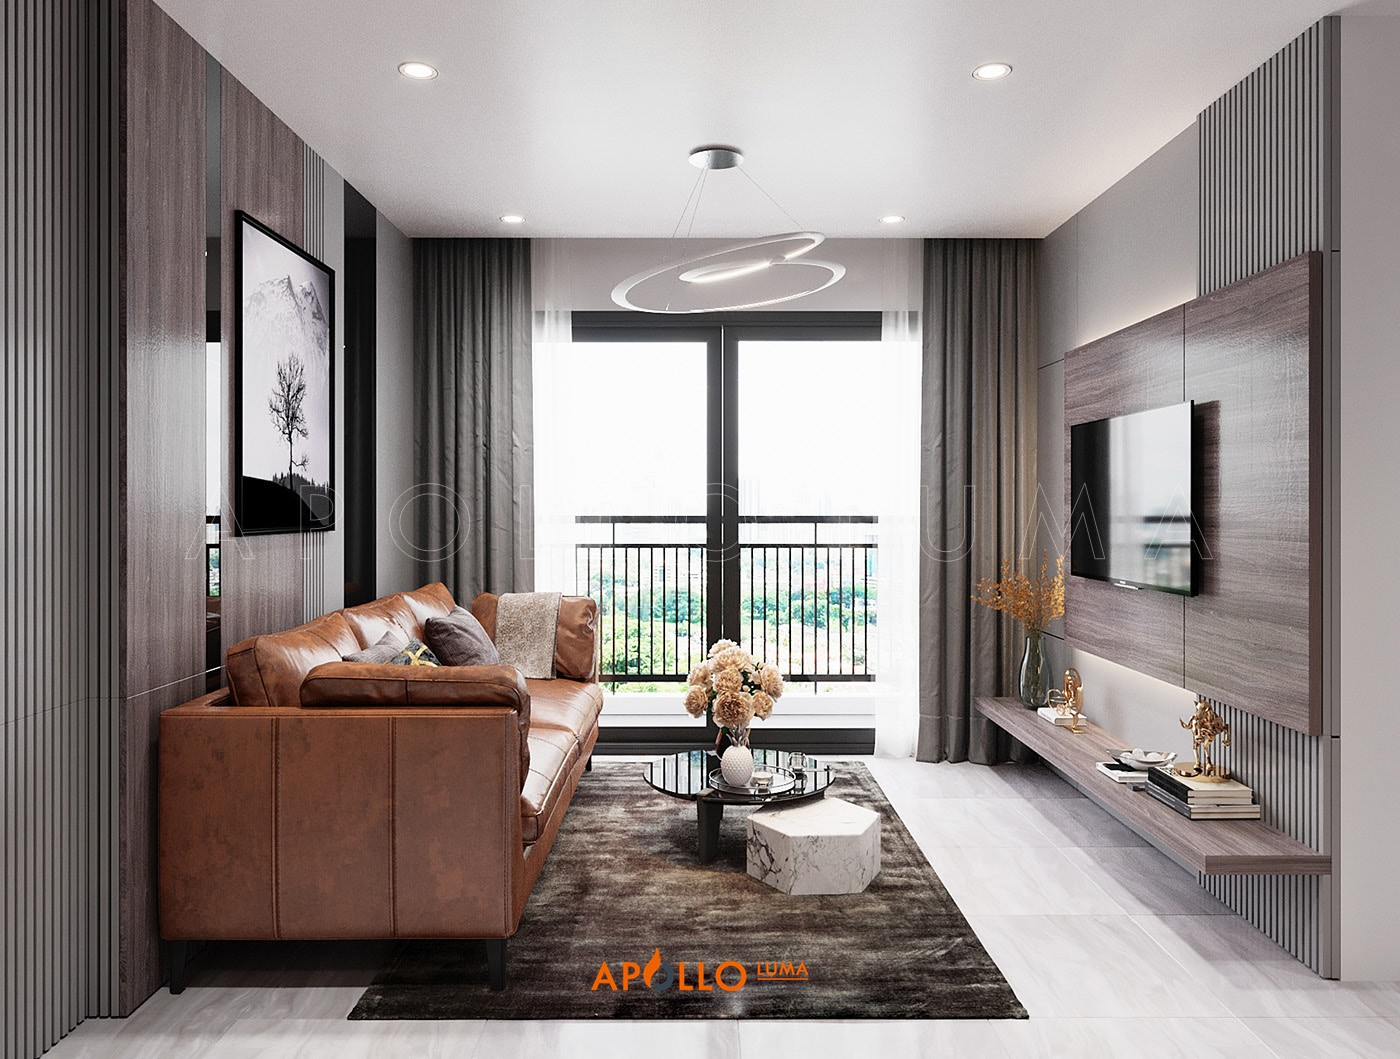 Thiết kế nội thất căn 3PN (75m2) S1.09-11 Vinhomes Ocean Park